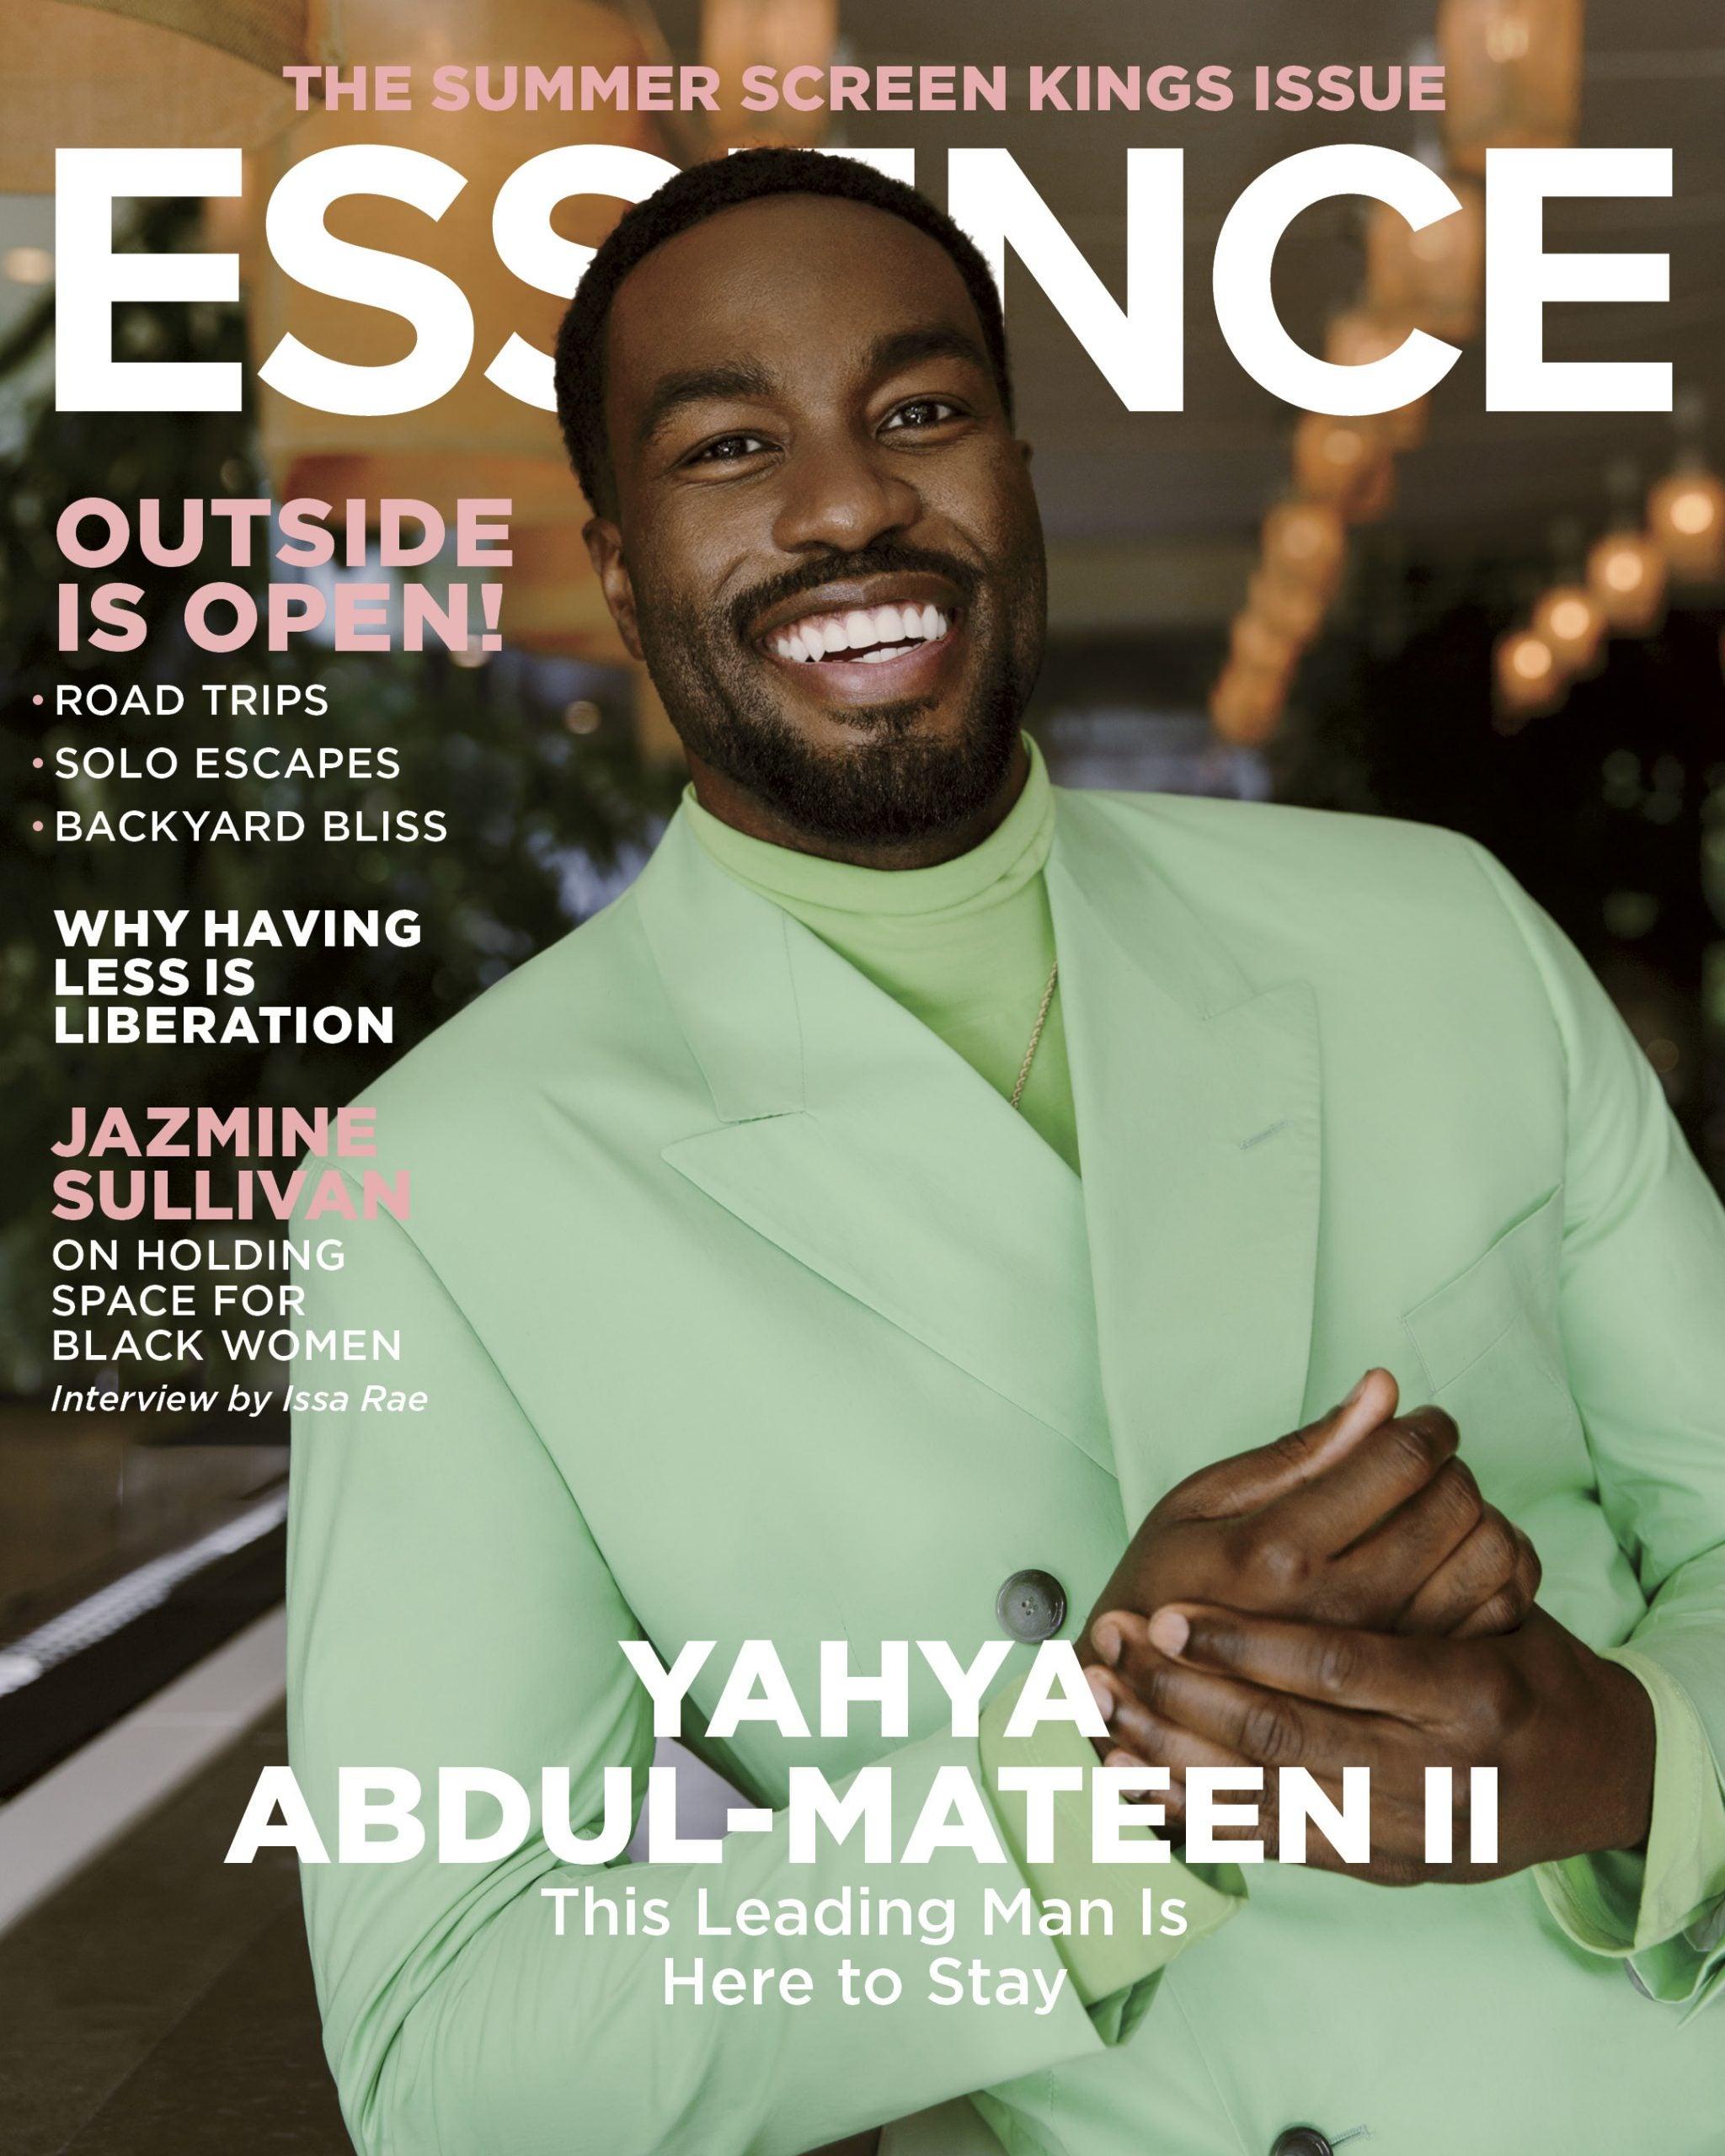 Yahya Abdul-Mateen II: The Leading Man Who Loves Black Women - Essence